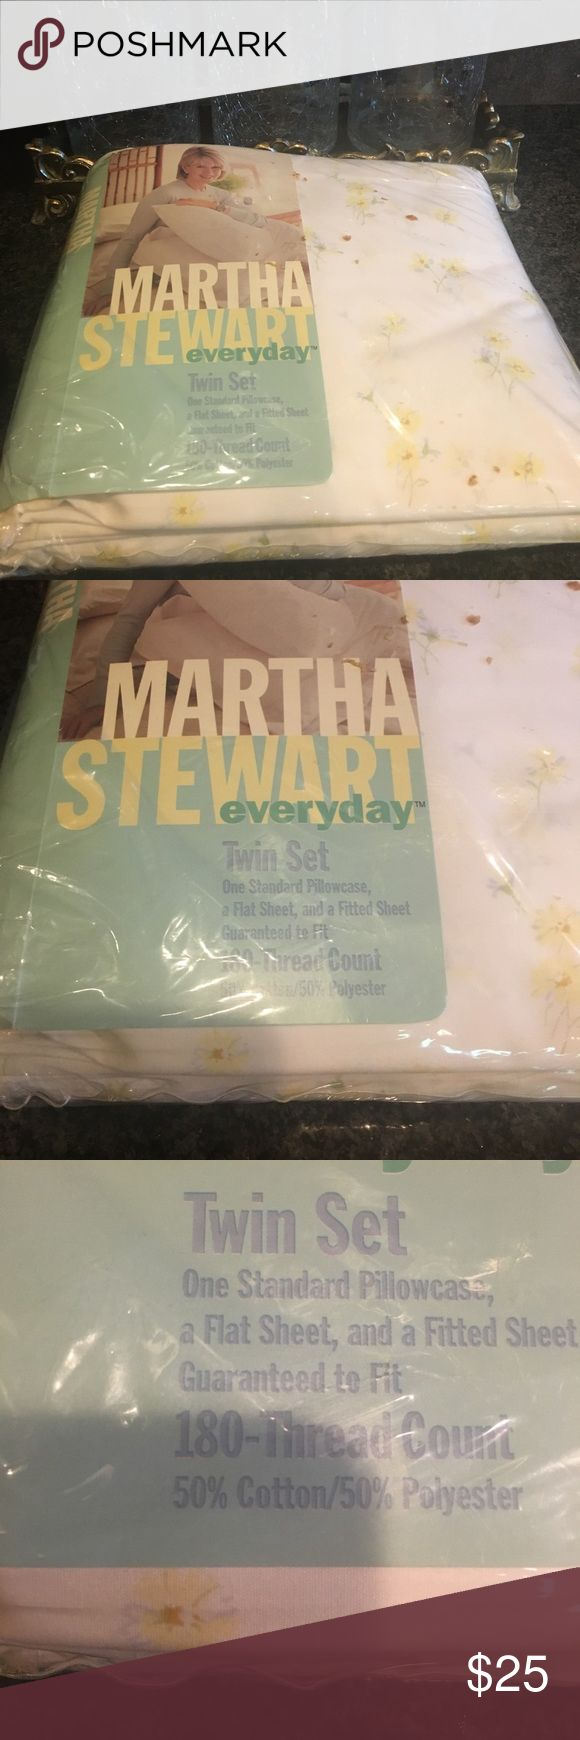 Martha Stewart twin sheet set Martha Stewart mini daisy twin set . Comes with 1 standard pillow case, 1 flat sheet, and 1 fitted sheet. 180 thread count . Martha Stewart Other